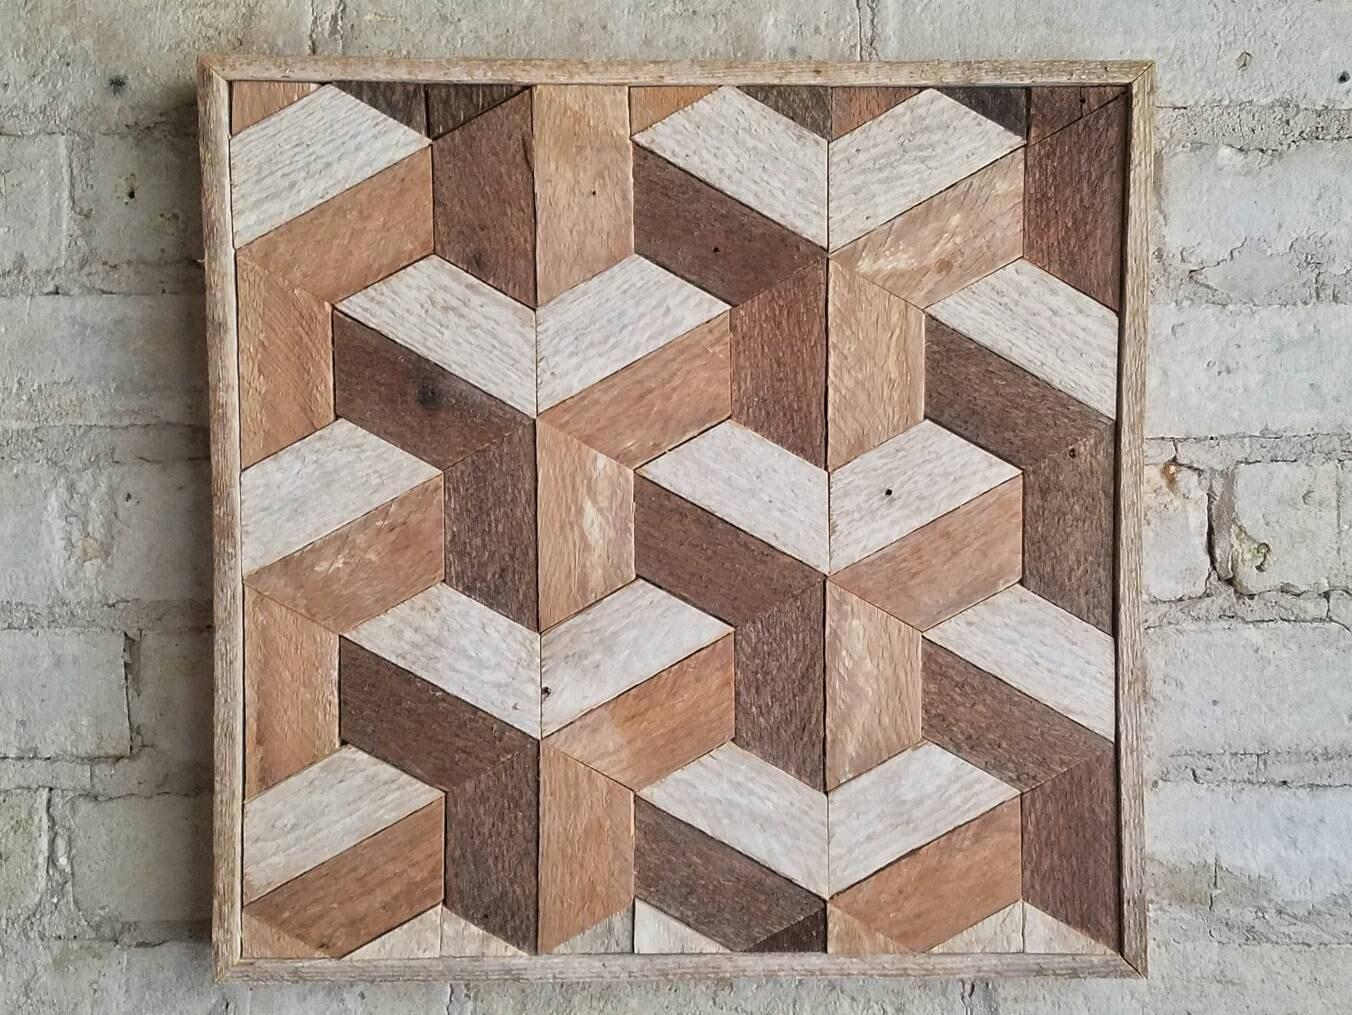 Reclaimed Wood Wall Art Part - 47: Reclaimed Wood Wall Art, Decor, Lath, Geometric Pattern, Tessellation, Small